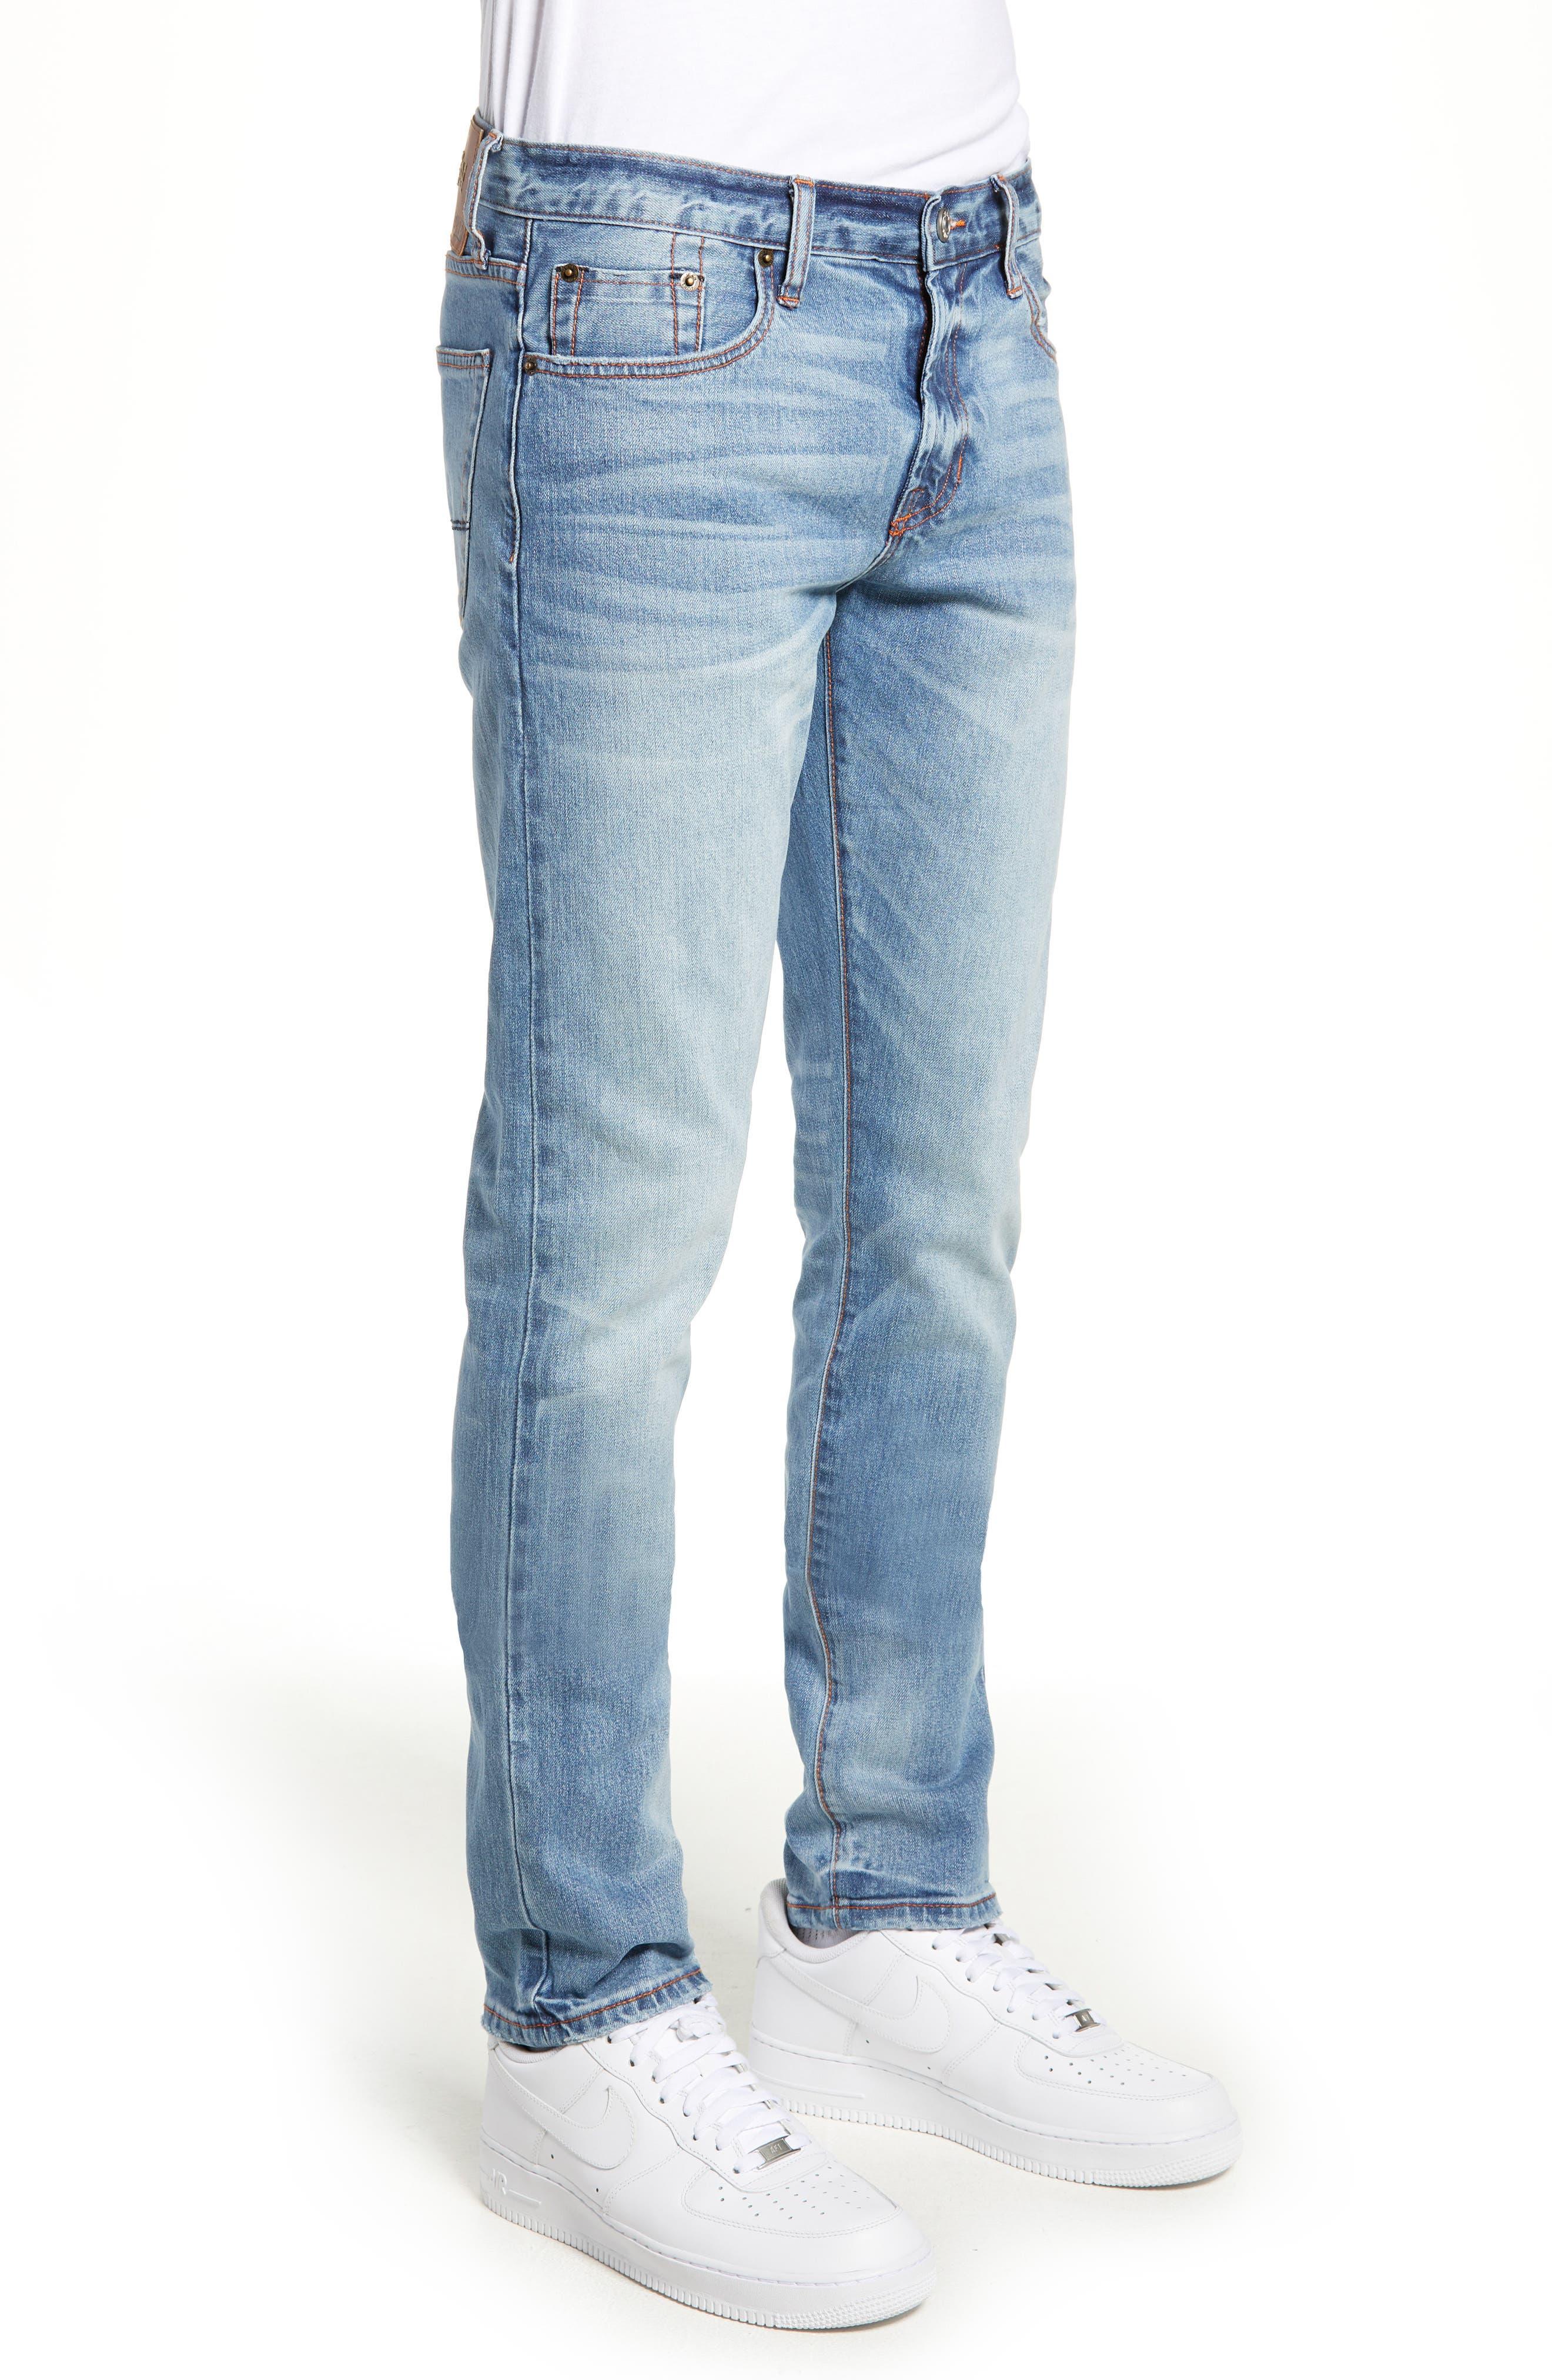 Jim Slim Fit Jeans,                             Alternate thumbnail 3, color,                             BROOME